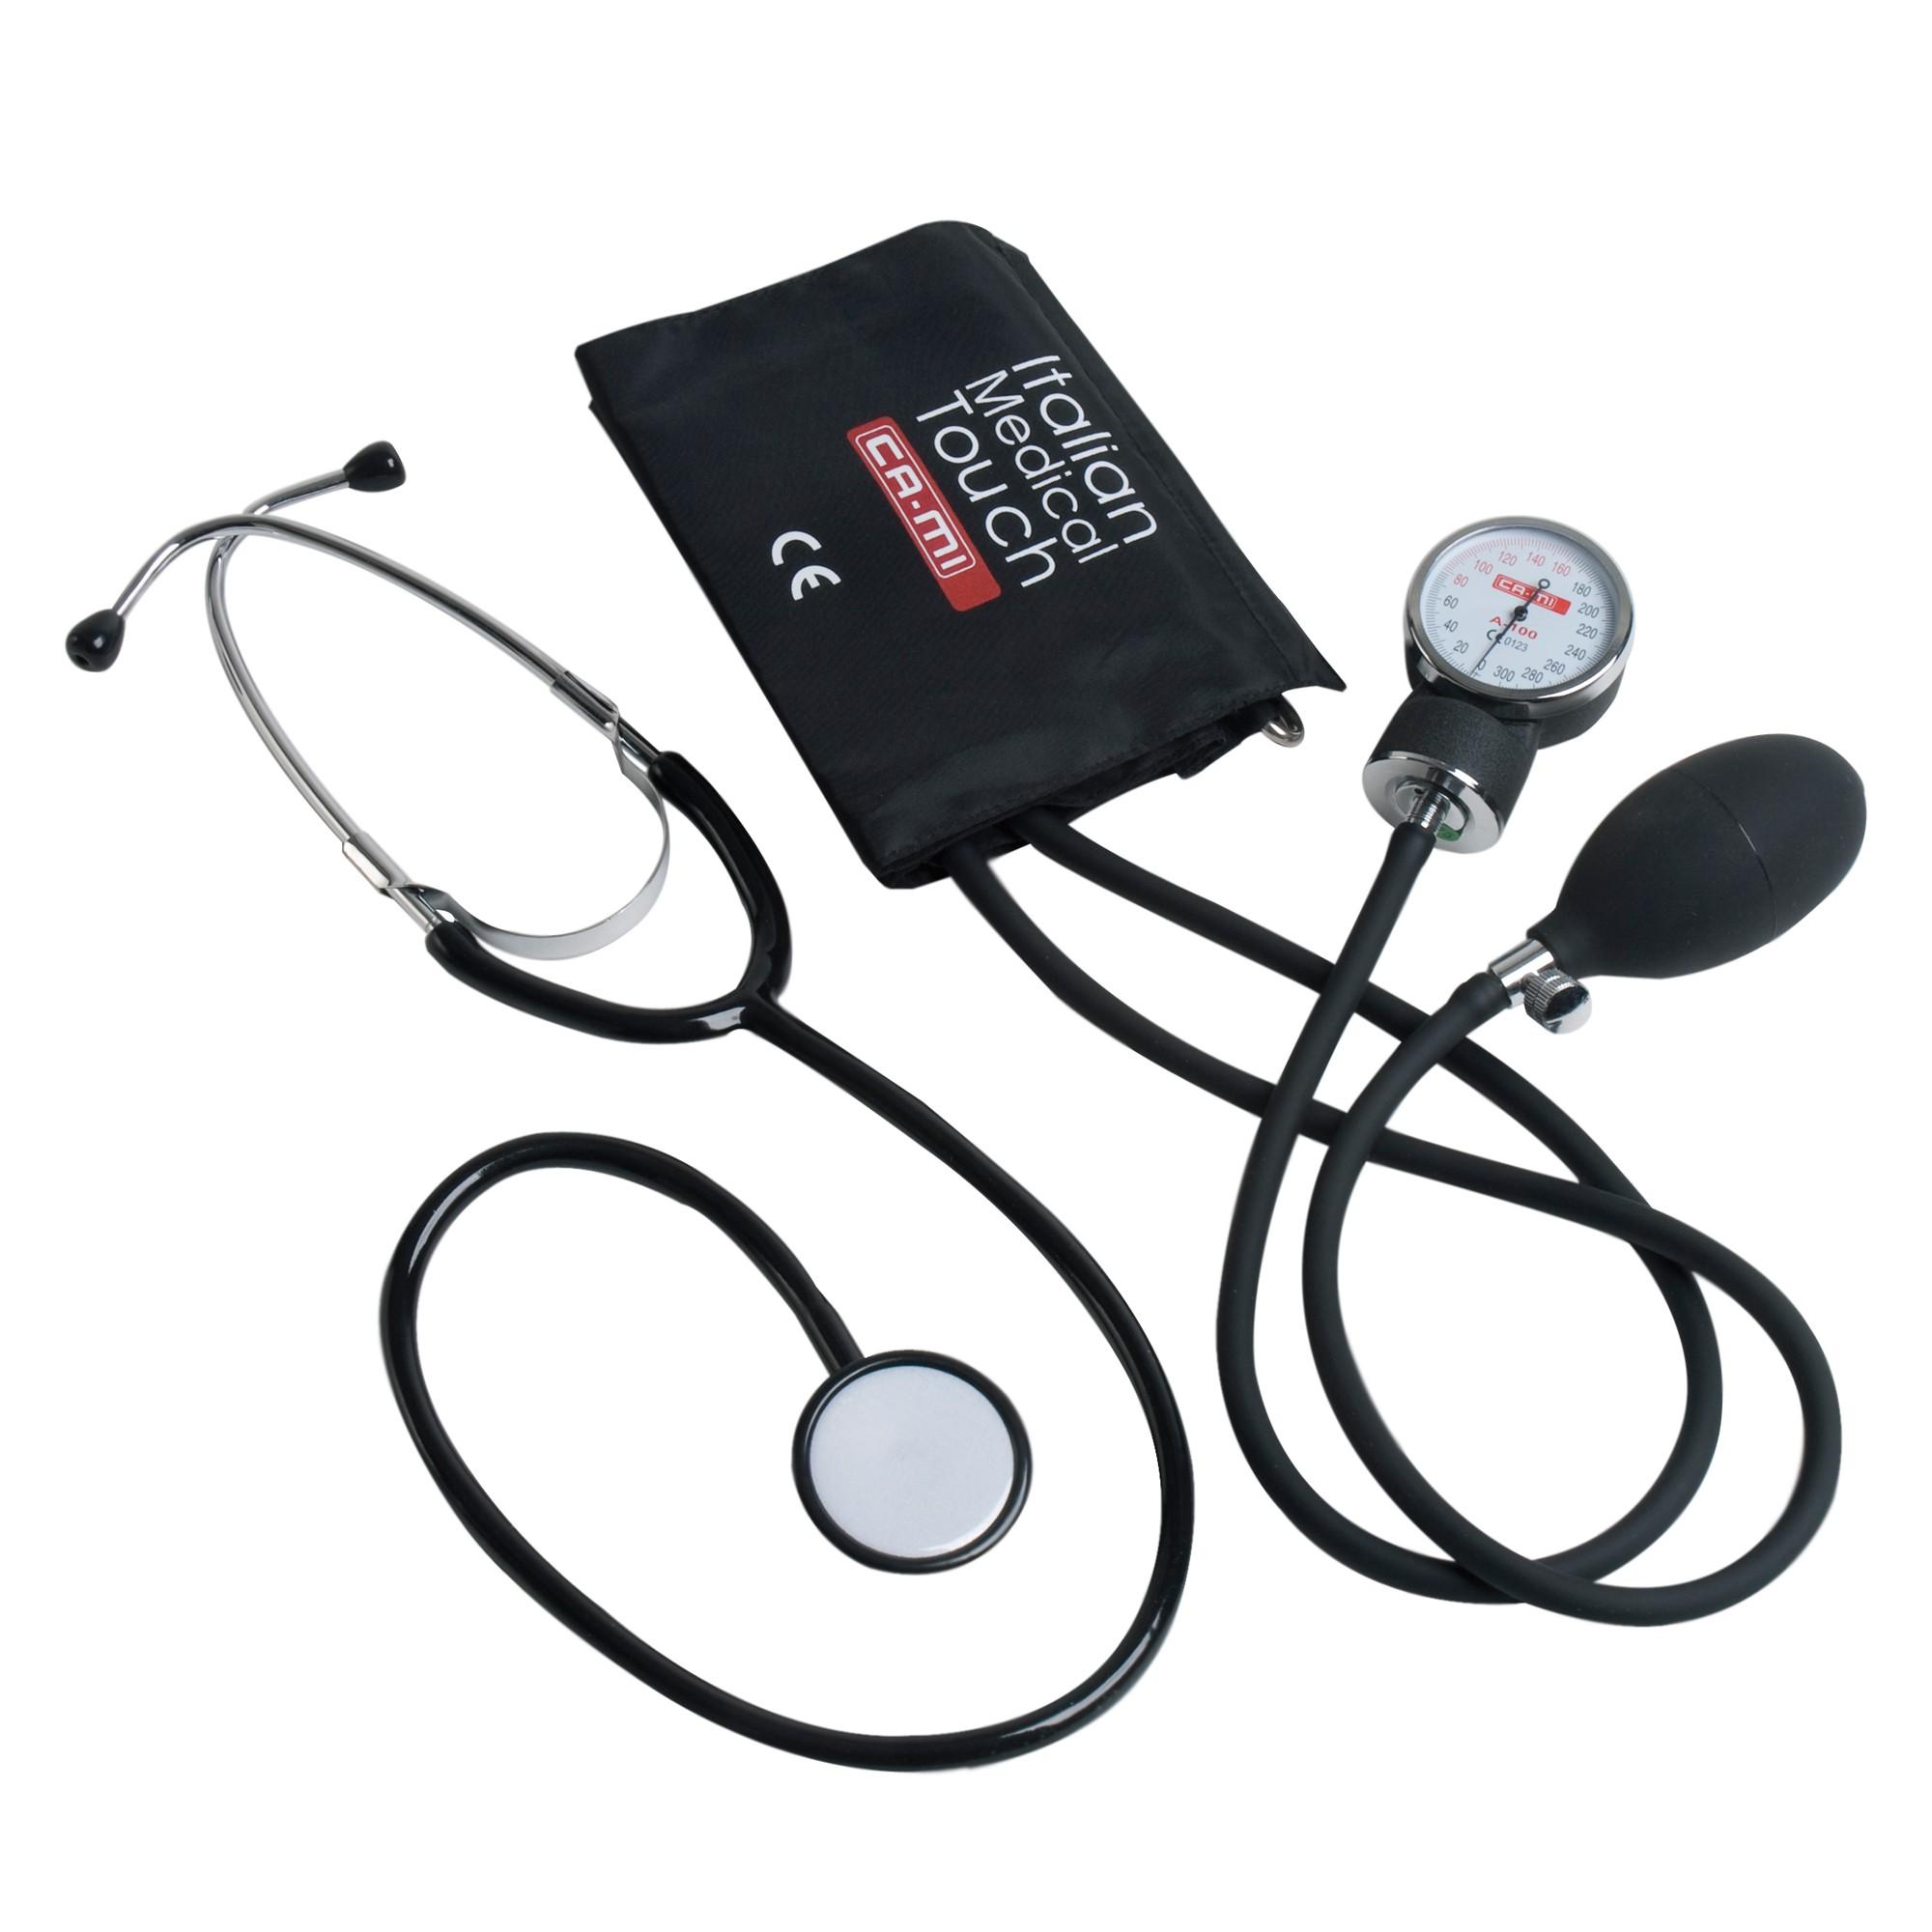 CA-MI A-100 Aneroid Blutdruckmessgerät + Stethoskop Diagnostik ...